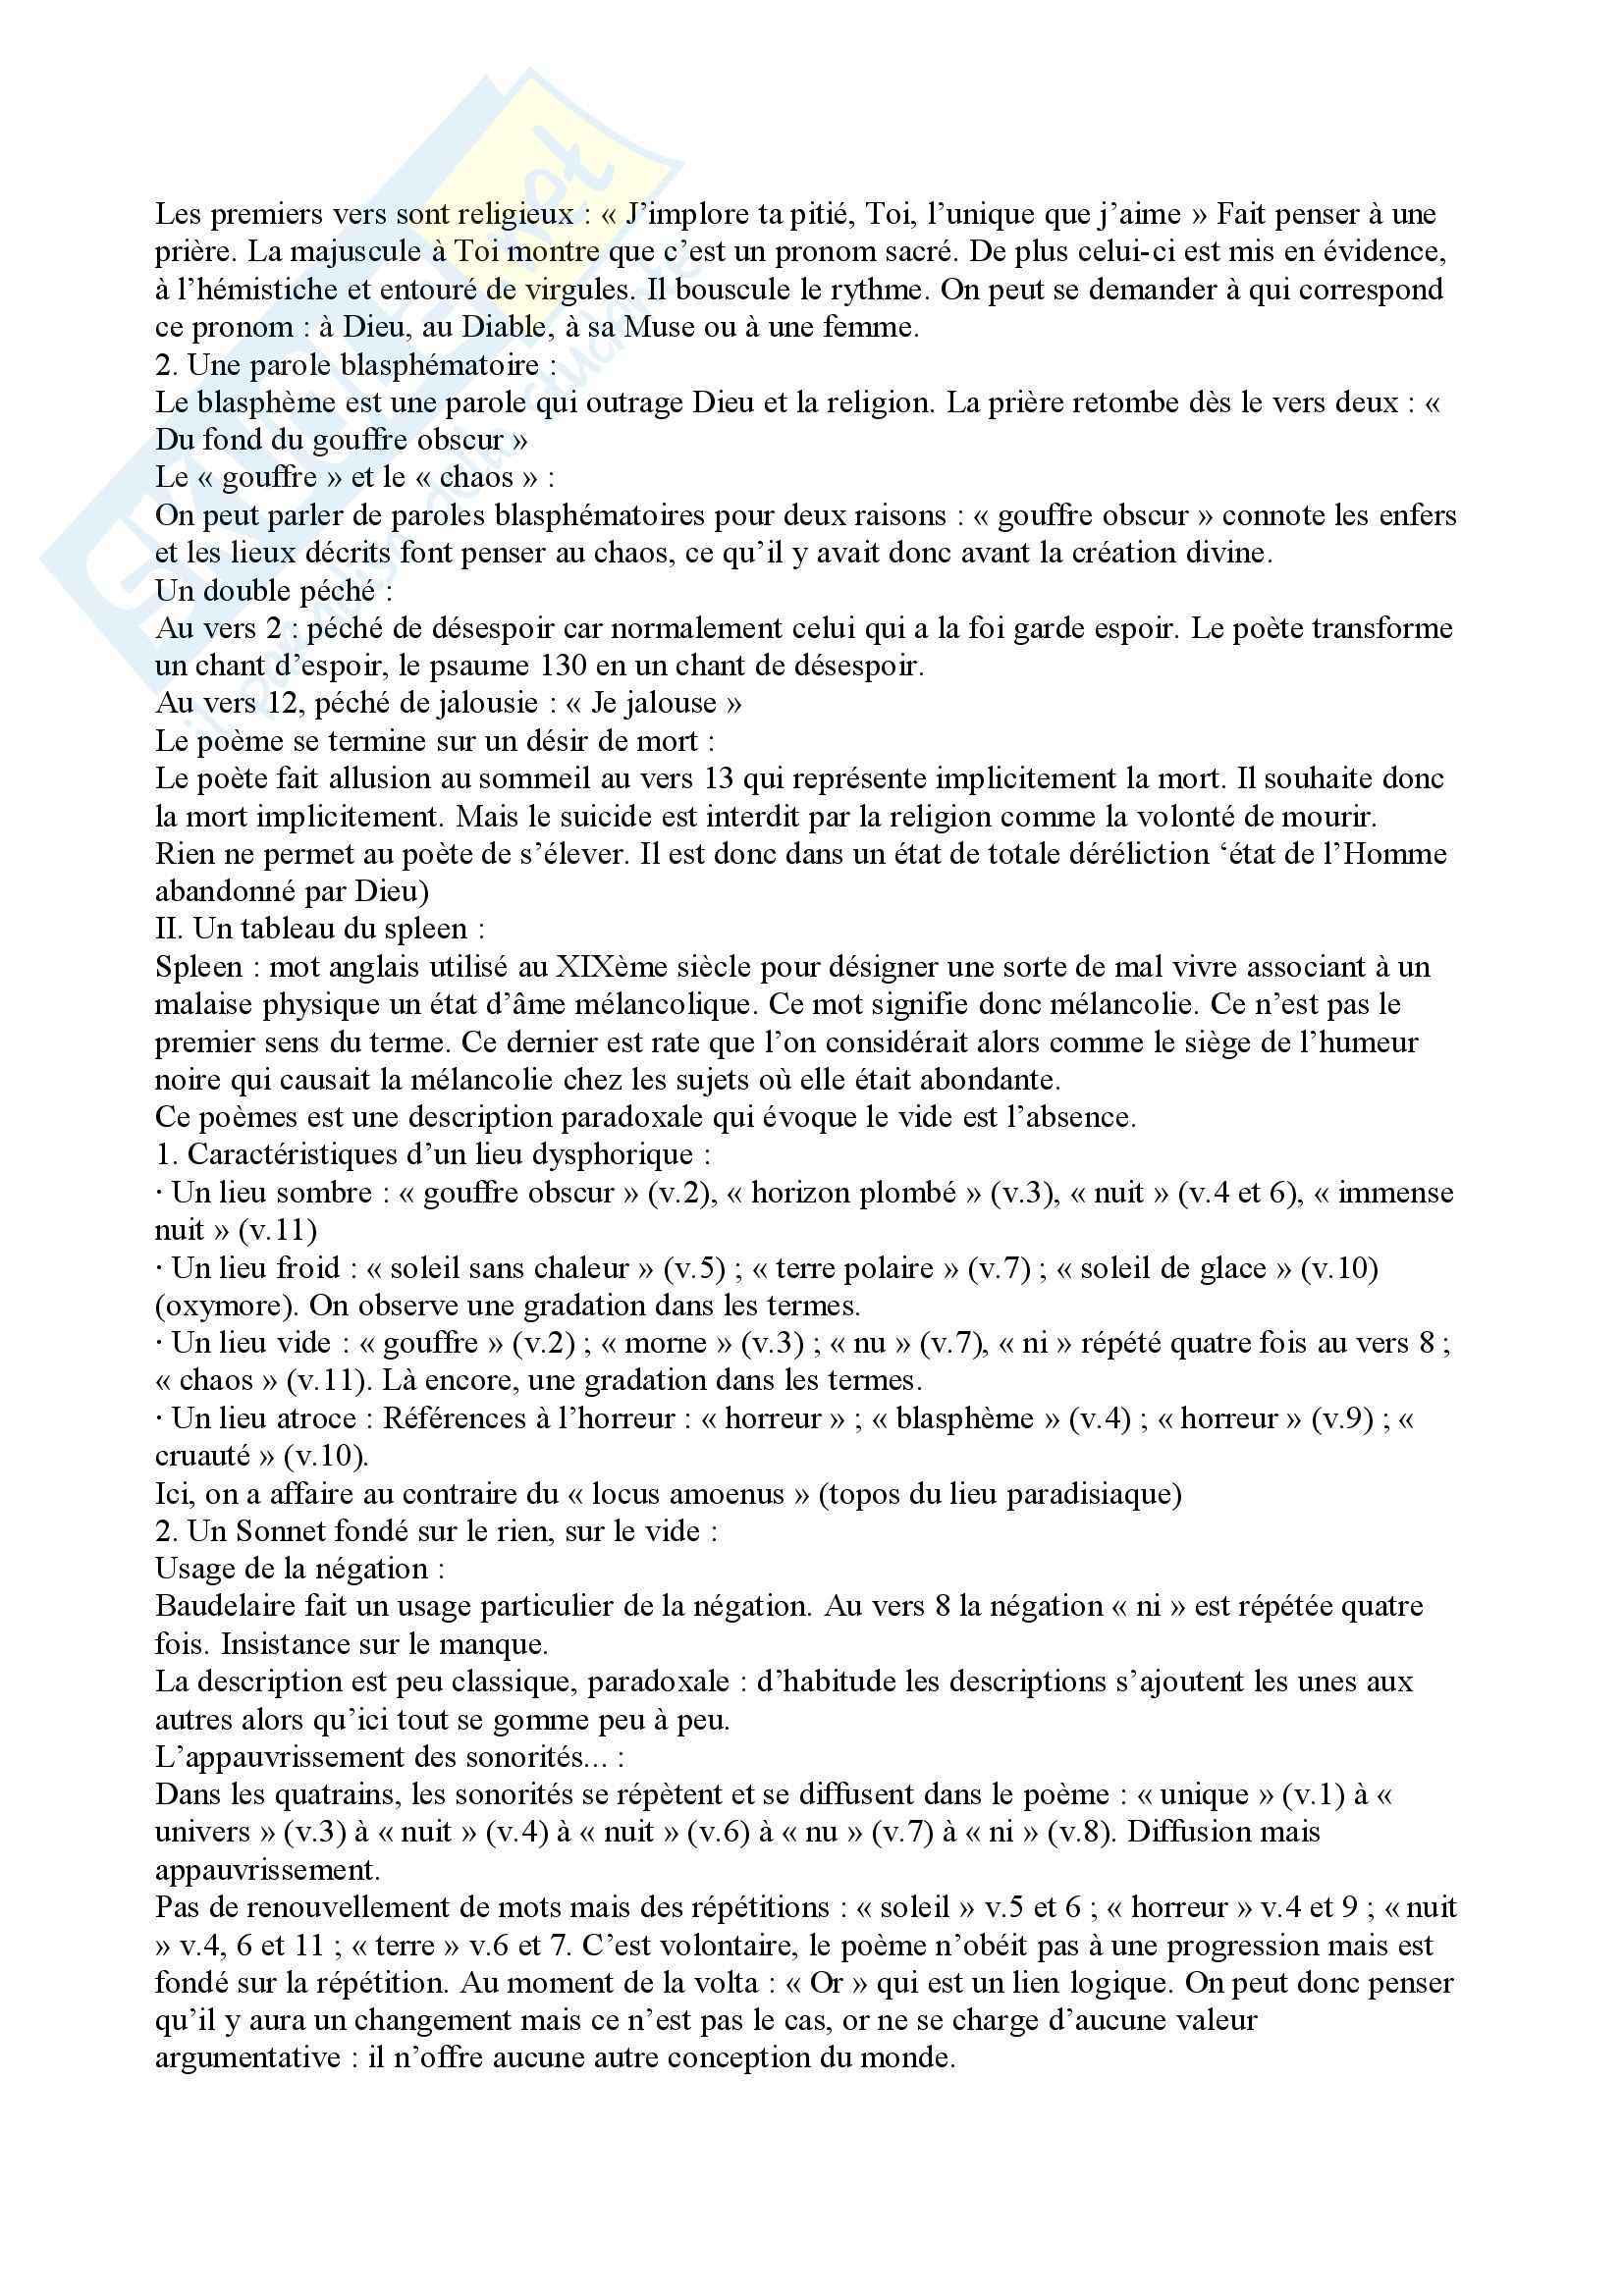 I fiori del male, Baudelaire - analisi poesie Pag. 21